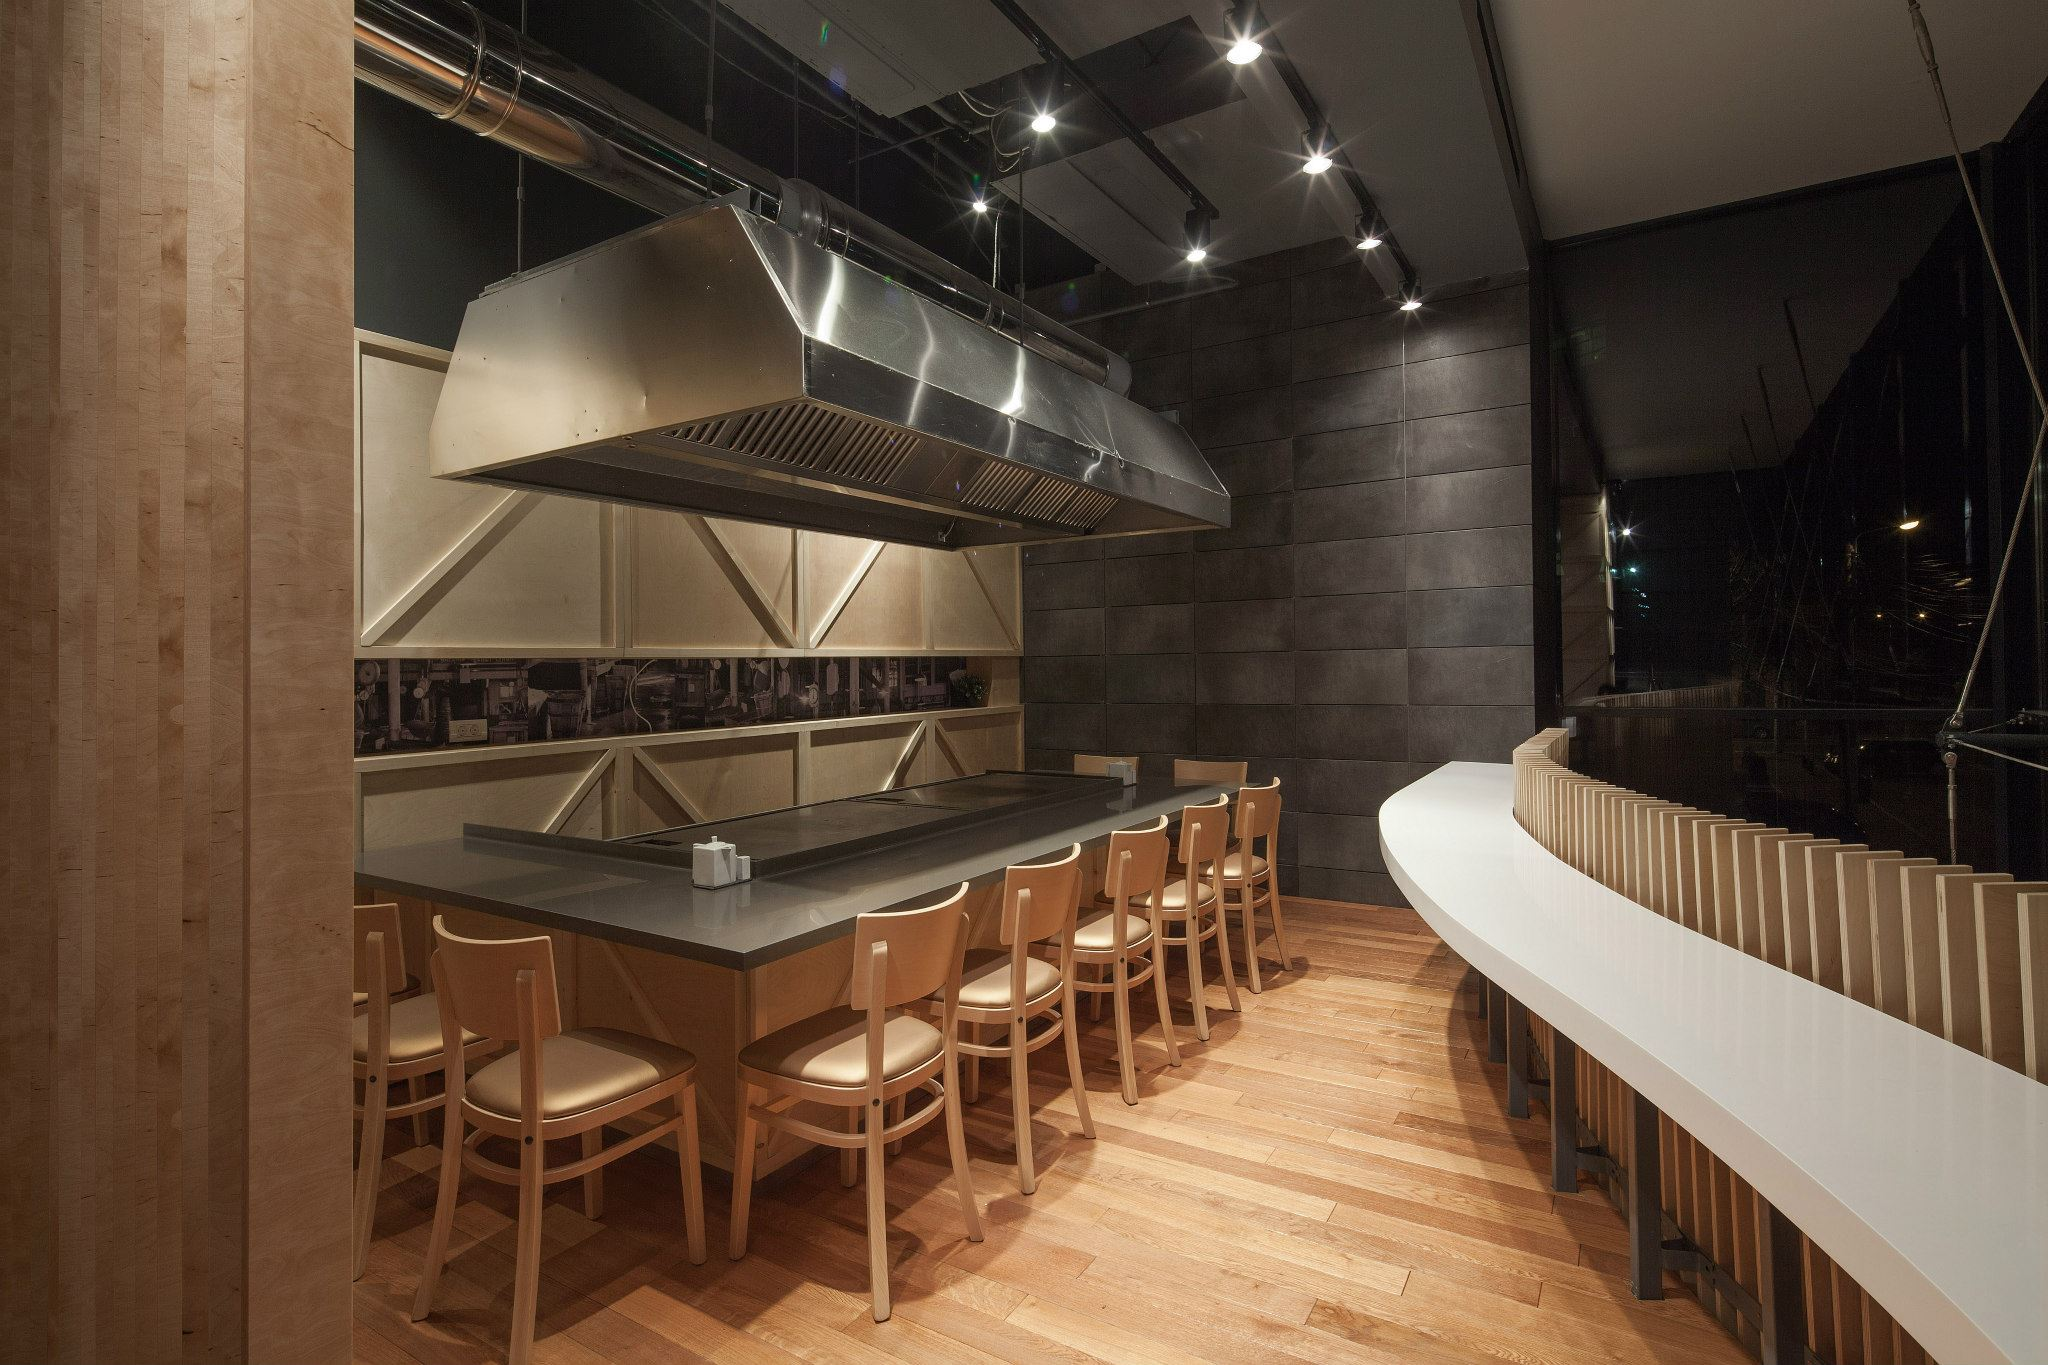 YOSHI-Sushi-Teppanyaki-Trivenus-Ama-Design-18